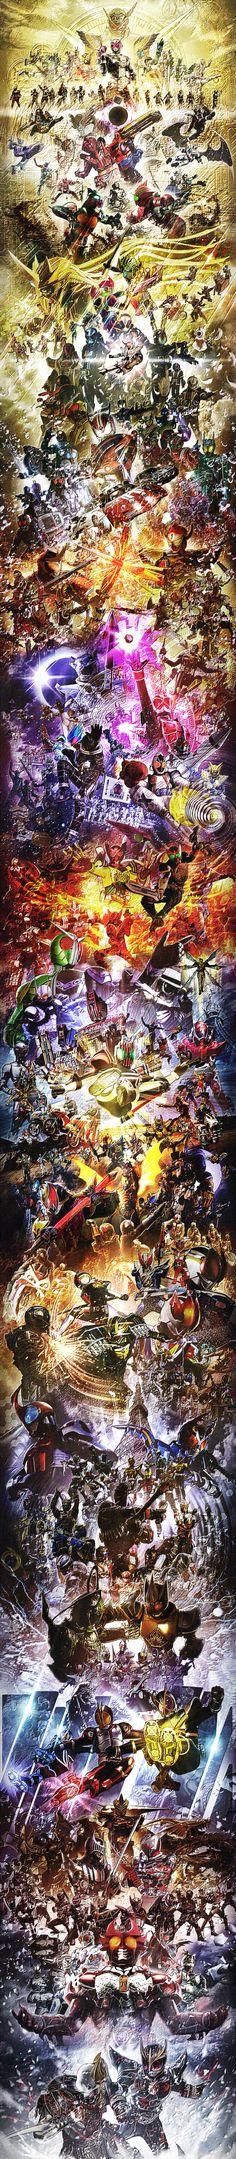 Kamen Rider All Heisei Generations by on DeviantArt Kamen Rider Decade, Kamen Rider Ex Aid, Kamen Rider Series, Wallpaper Earth, Sword Art Online, Power Rangers, Anime, Deviantart, Superhero